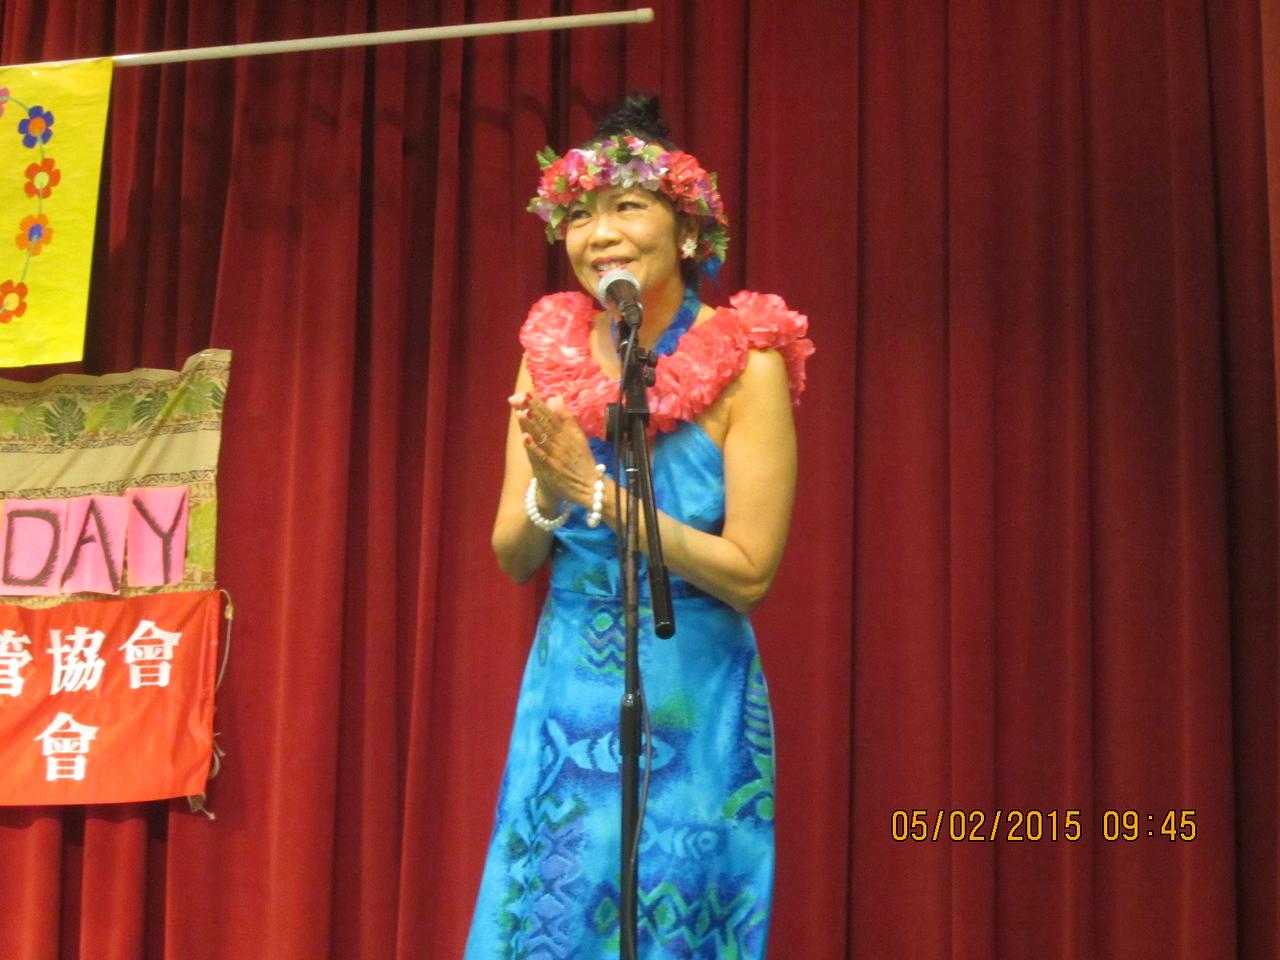 Joseline (Joss) the beautiful, graceful hula dancer